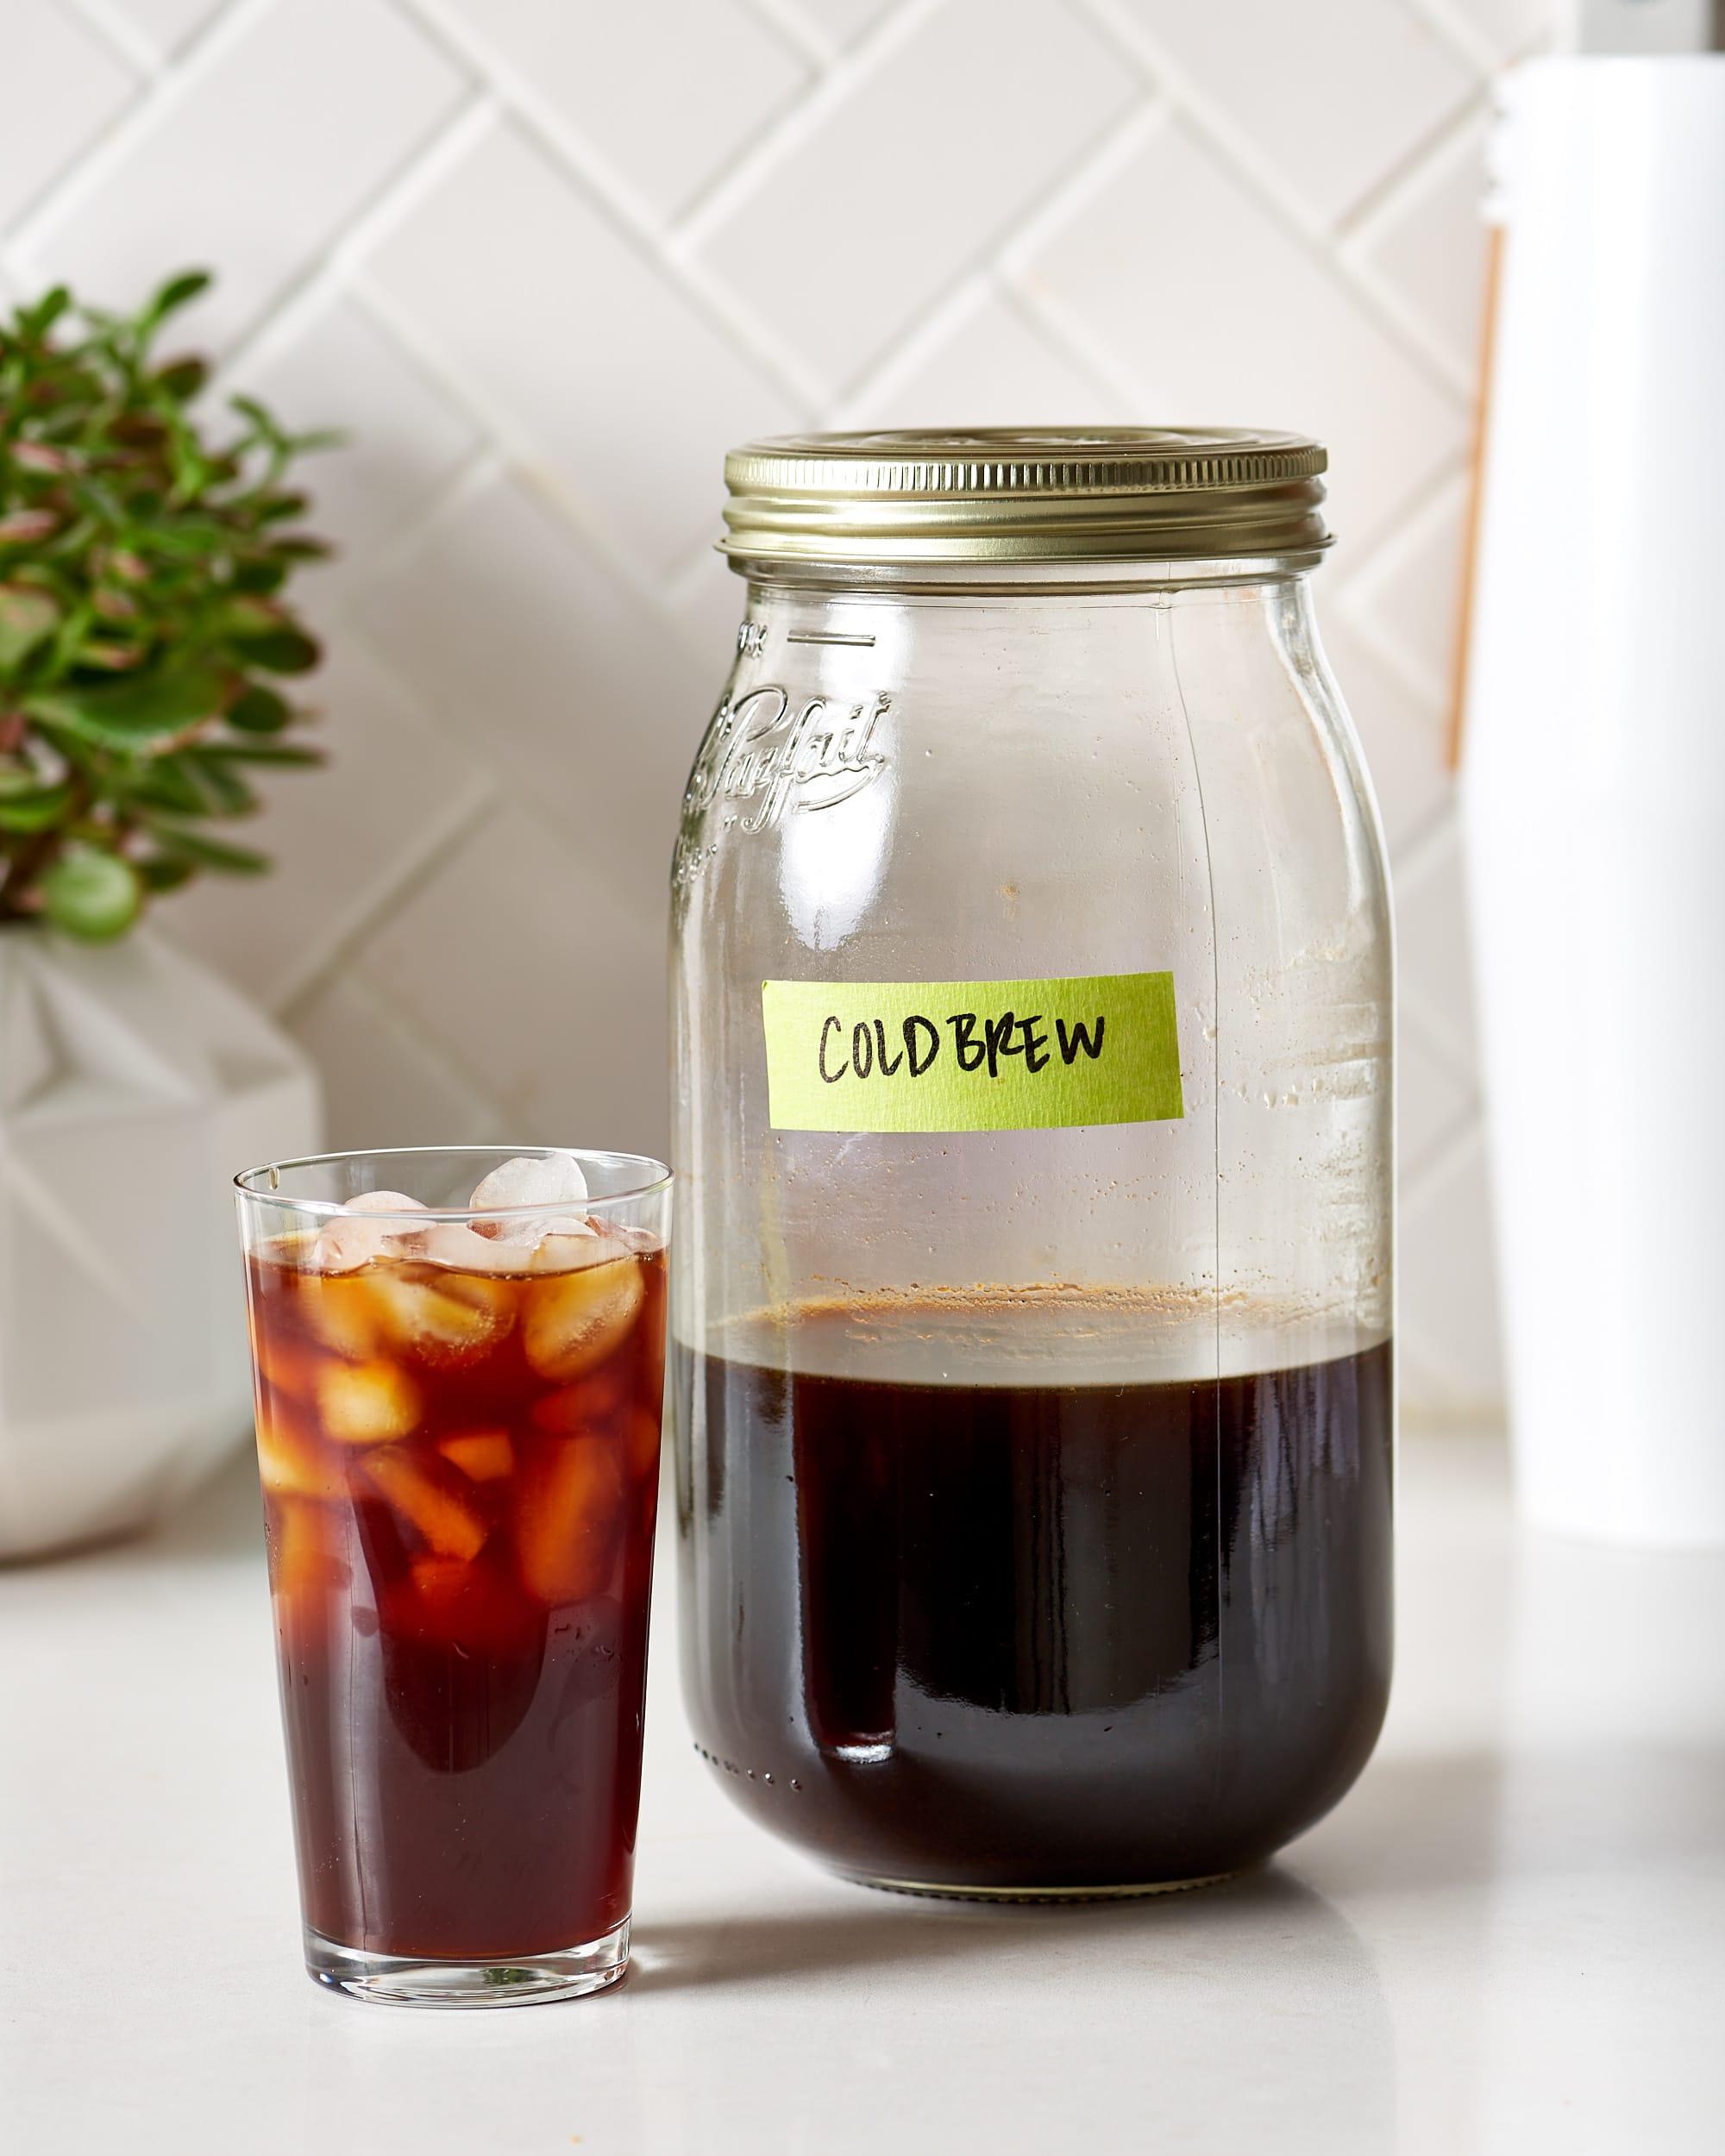 How to Make Cold Brew Coffee - Big Batch Method   Kitchn